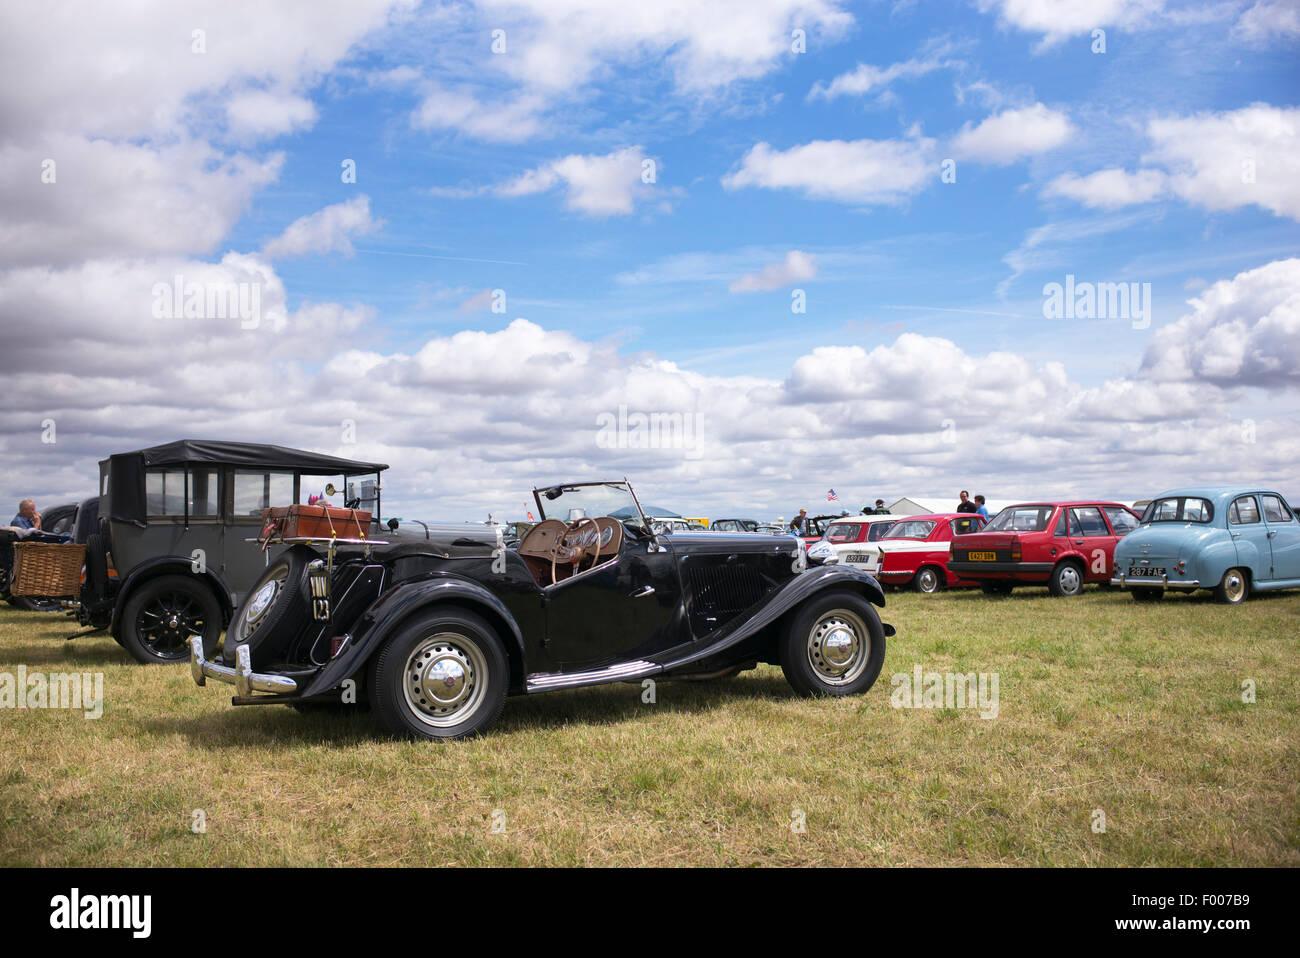 Morgan At A Classic Car Show England Stock Photo Alamy - Car show england